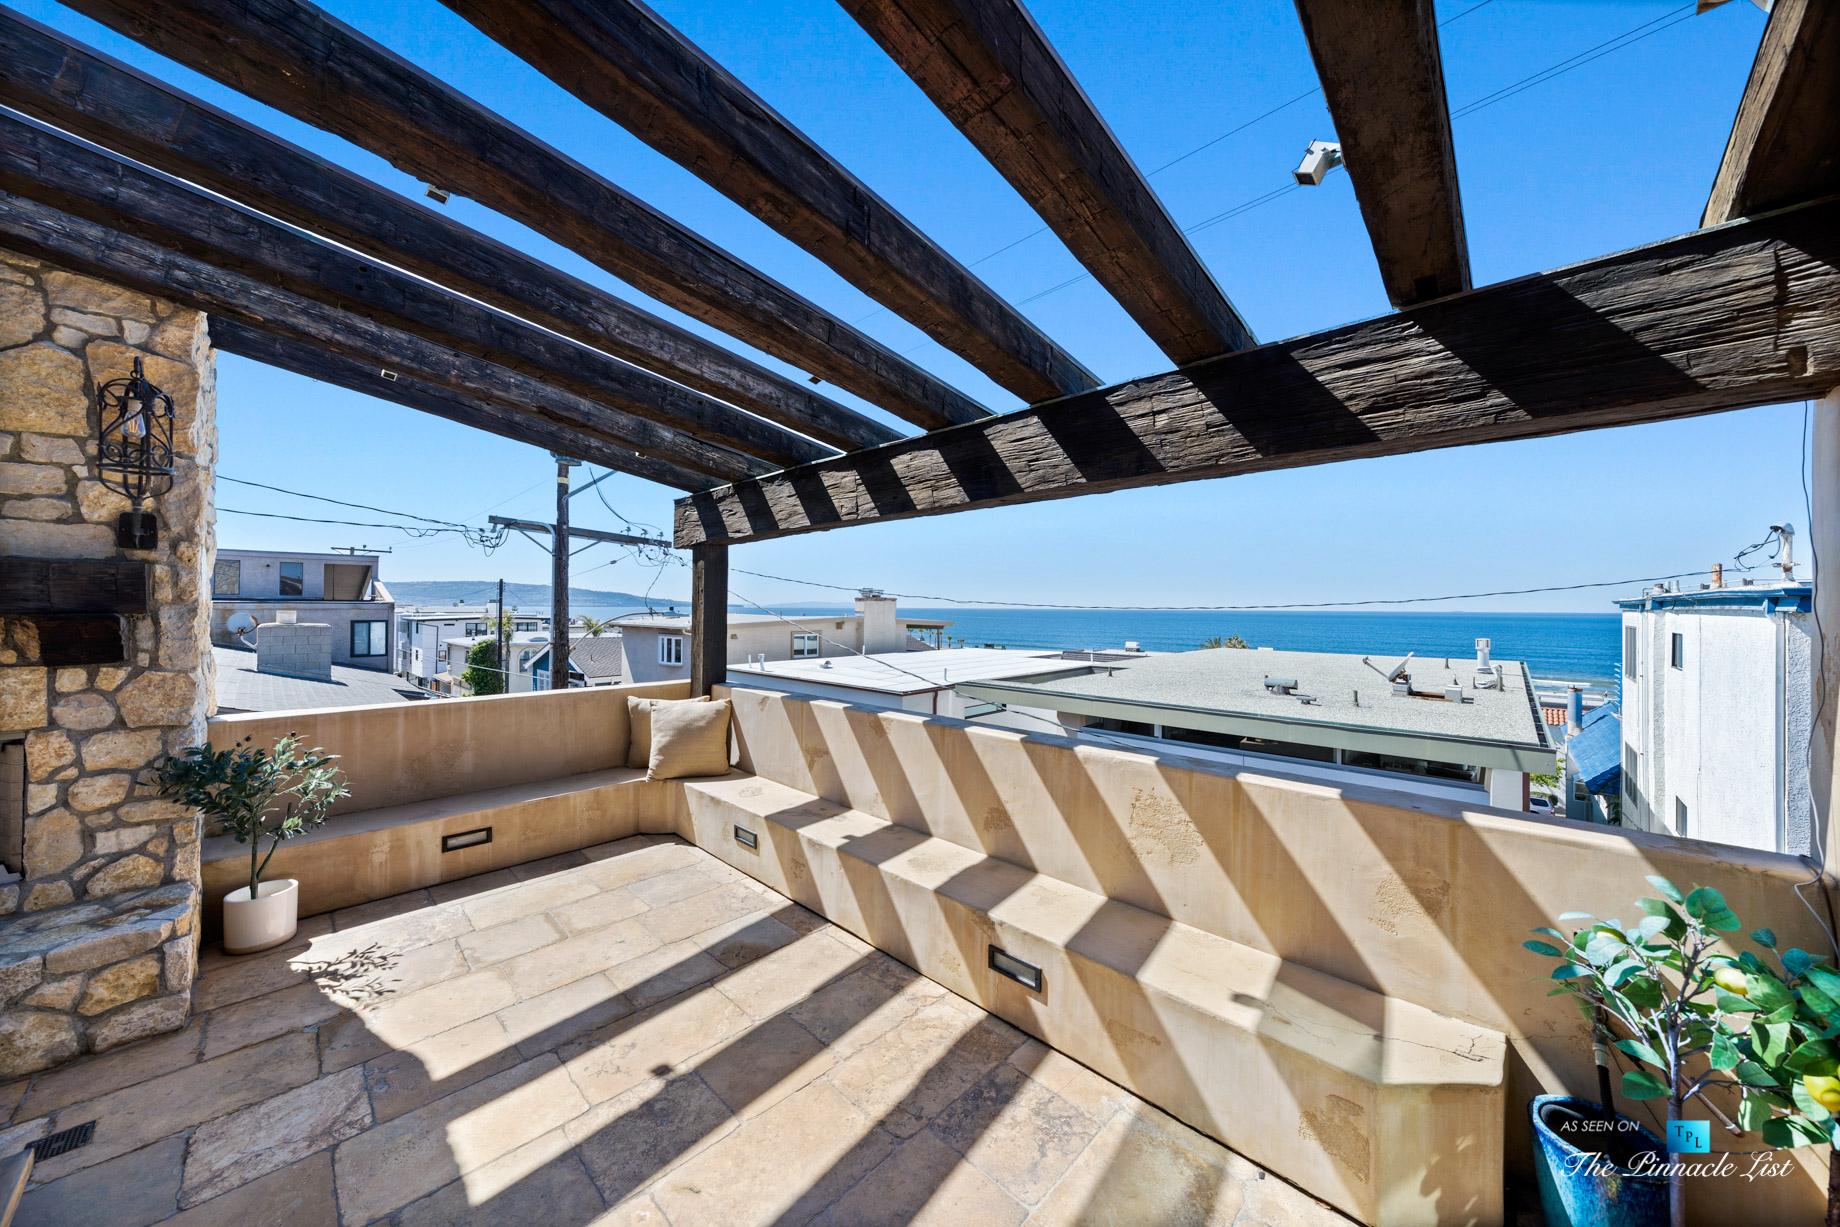 216 7th St, Manhattan Beach, CA, USA – Luxury Real Estate – Coastal Villa Home – Outdoor Balcony Seating